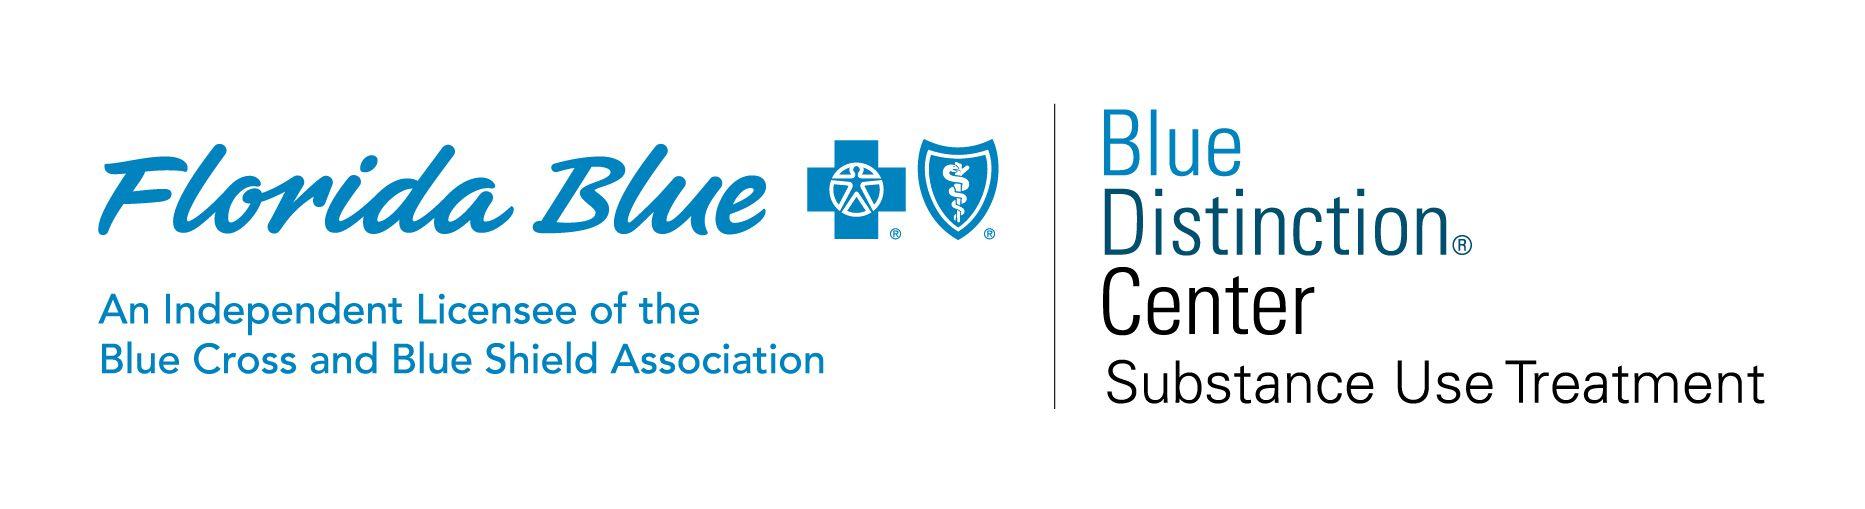 Blue Distinction Center-Substance Use Treatment